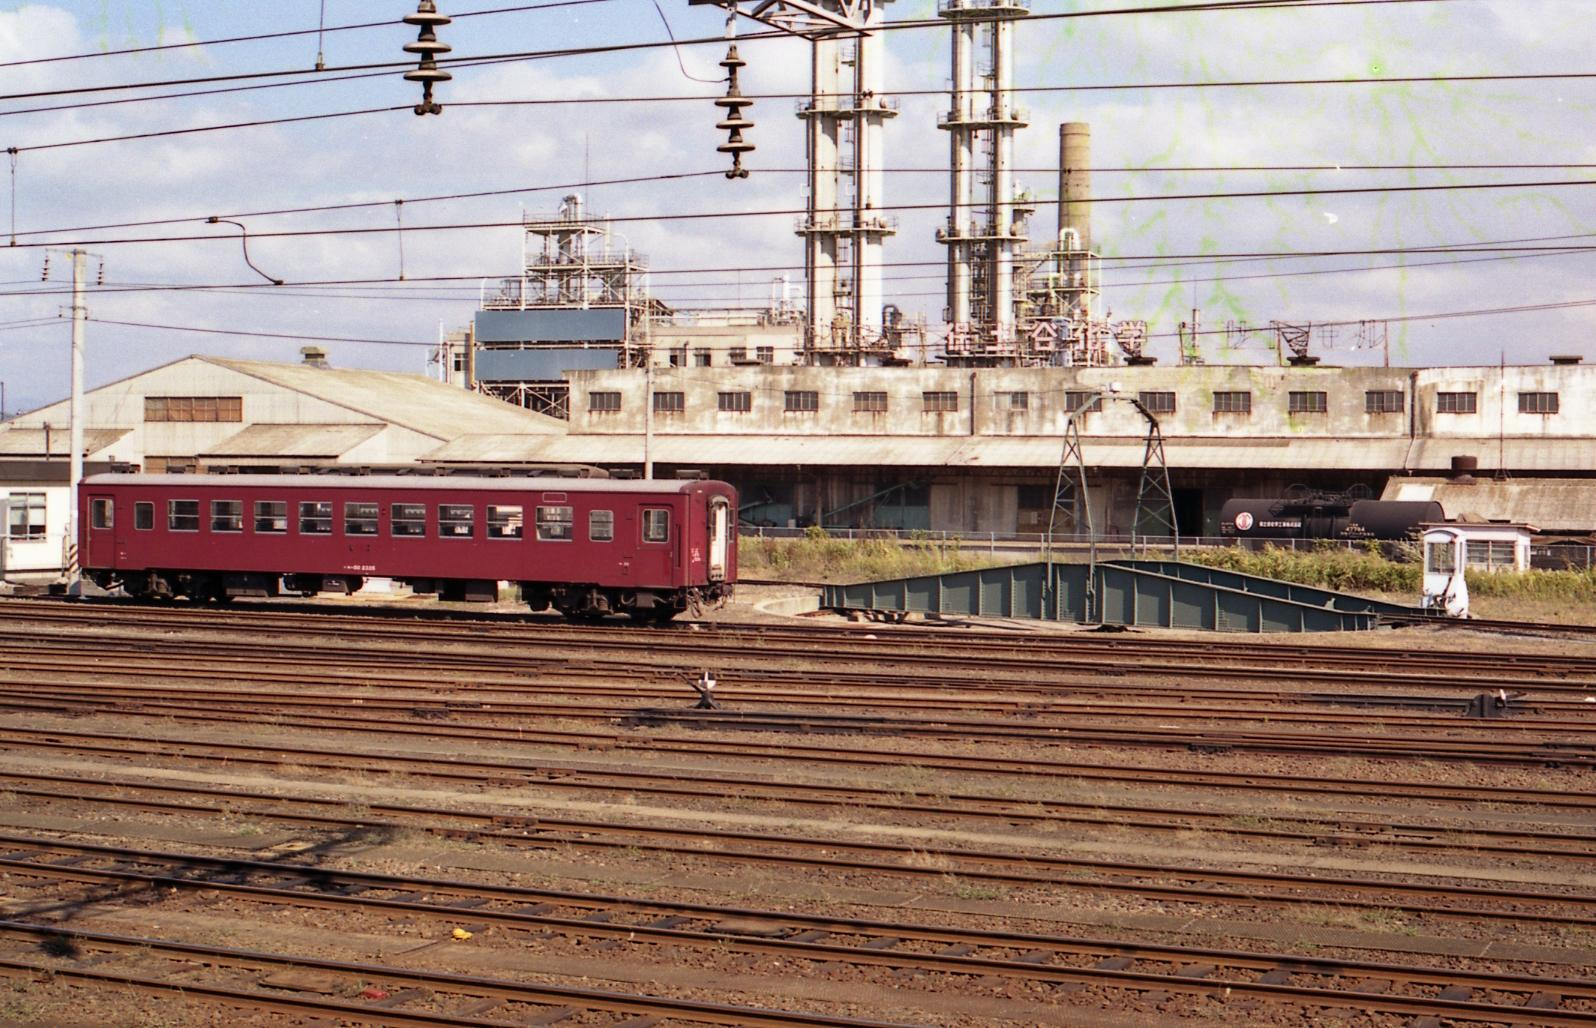 19840929a03